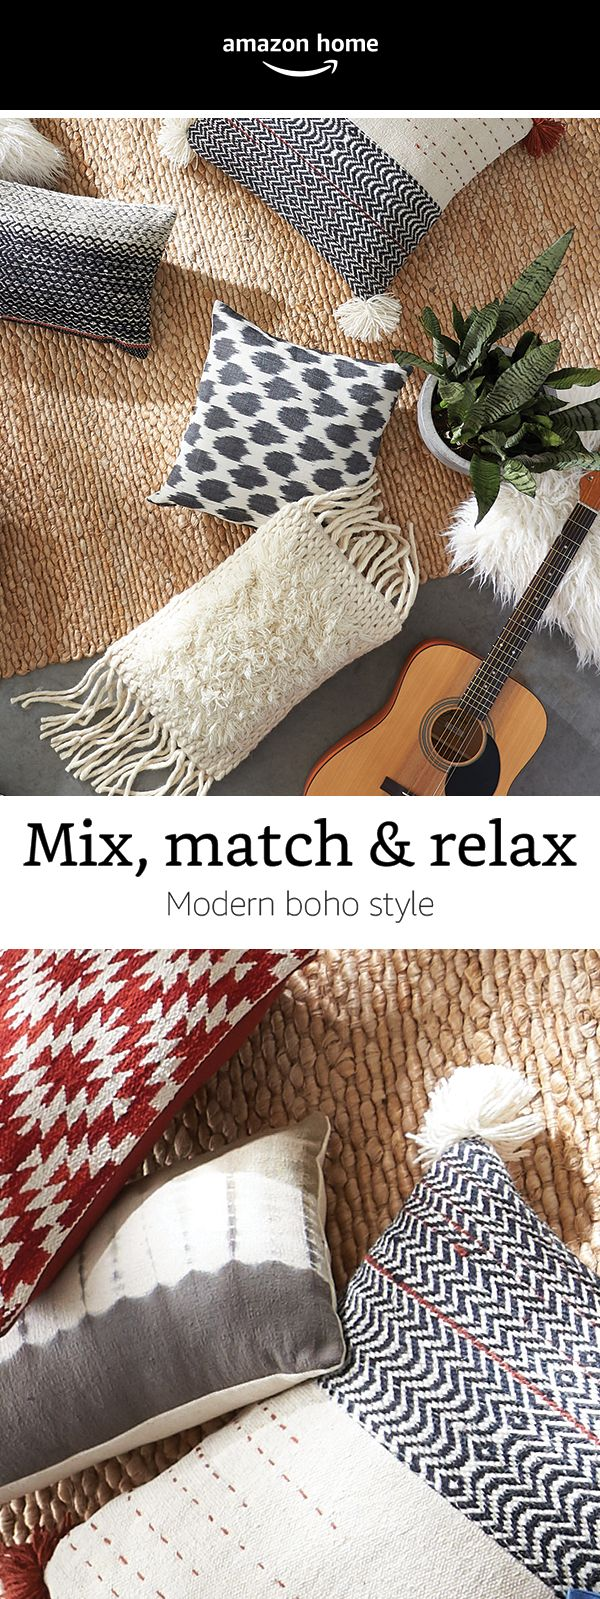 154330 Best Home Decor Images On Pinterest Home Live